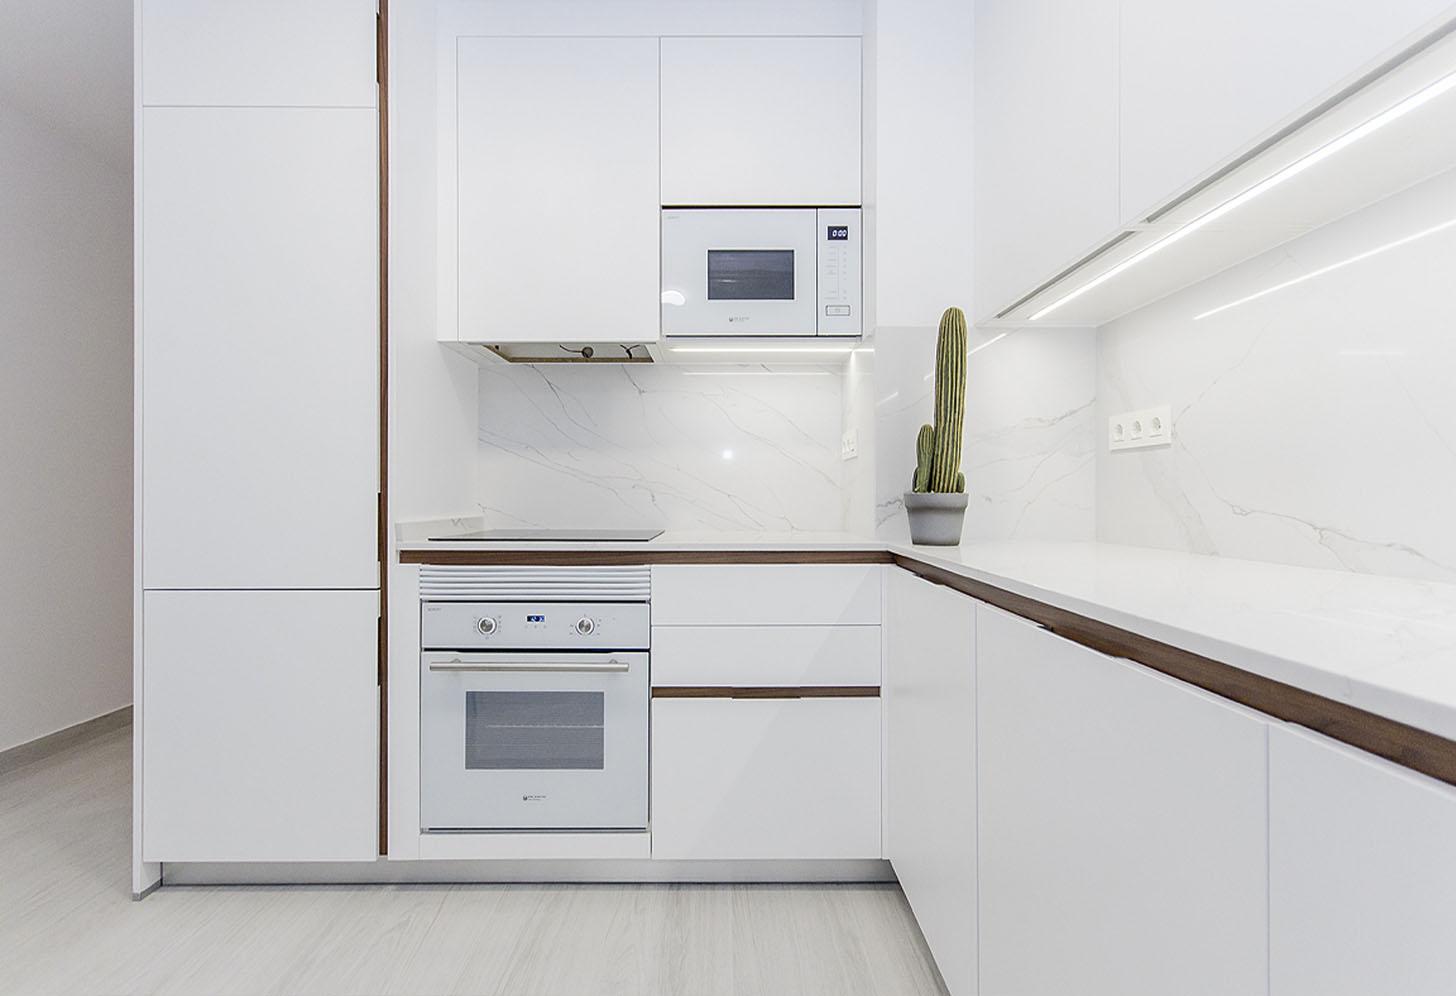 immobilier neuf espagne costa blanca on-p3 royal cuisine